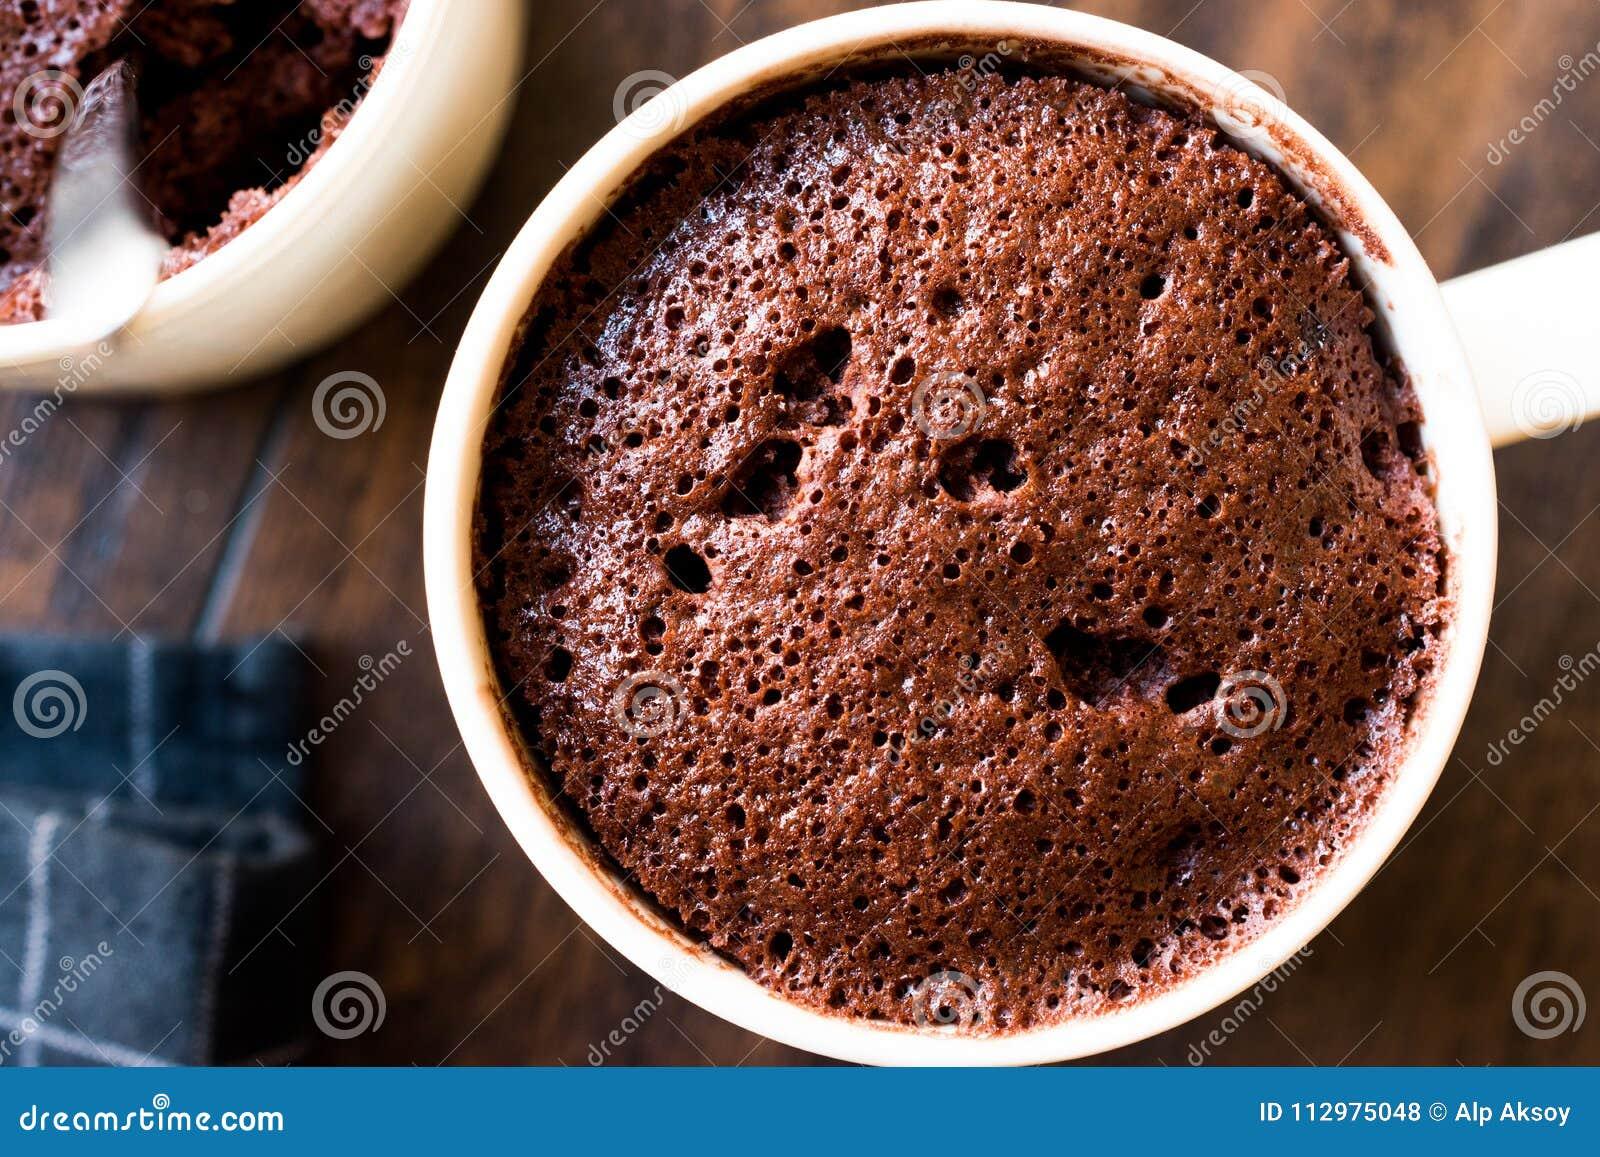 Microwave Brownie Chocolate Mug Cake Ready to Eat.